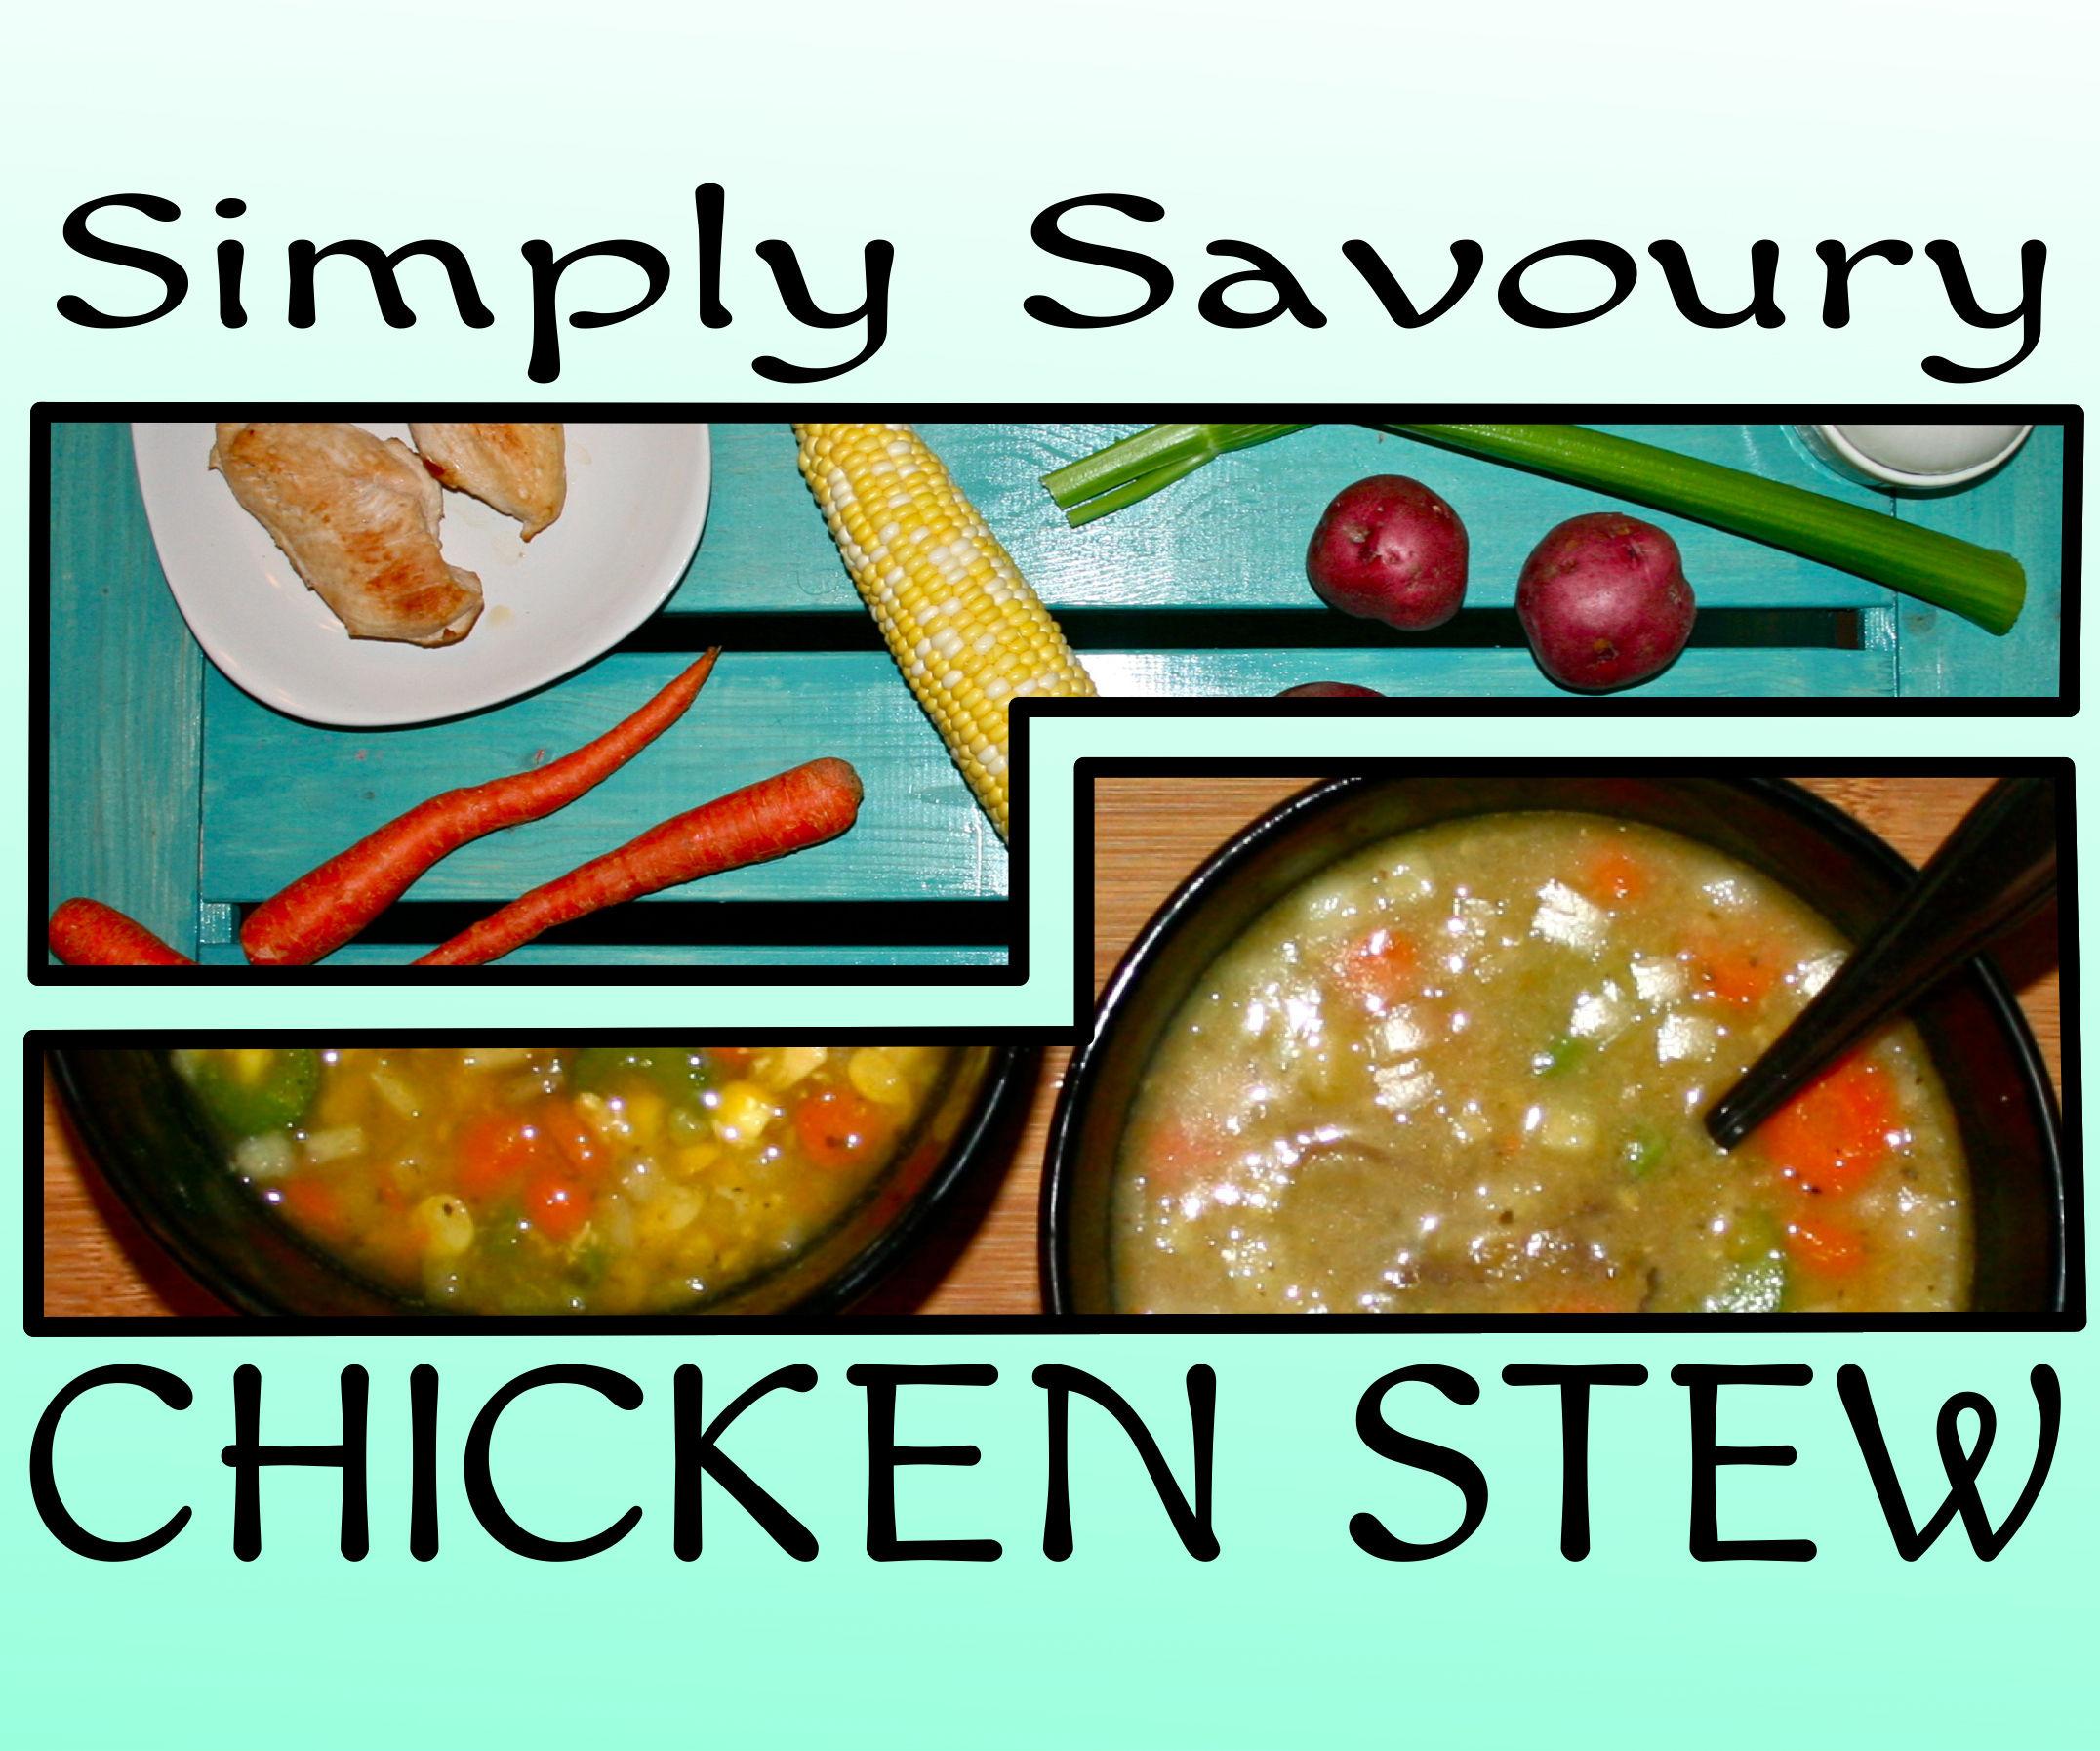 Simply Savoury Chicken Stew